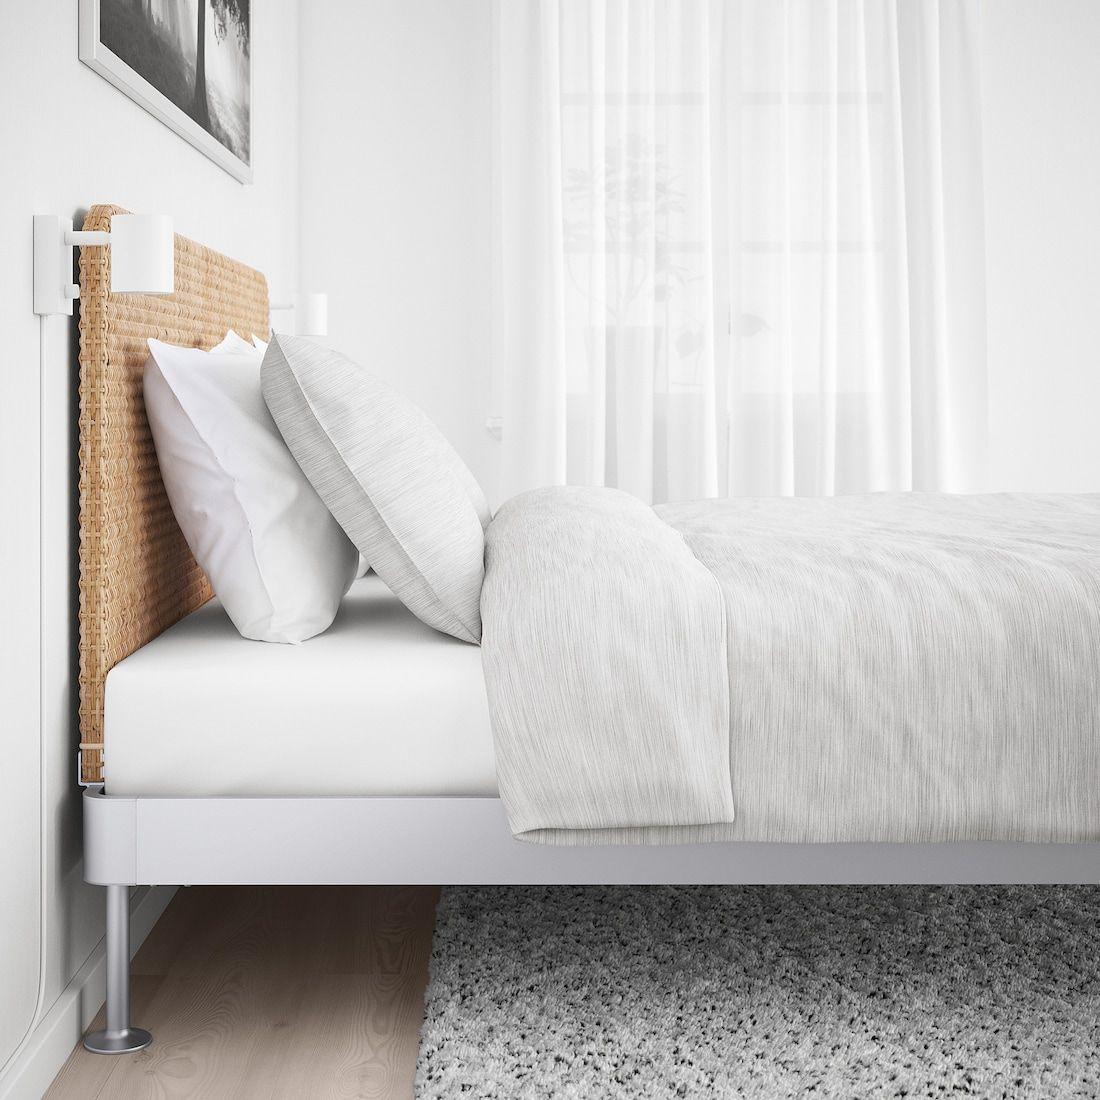 Delaktig Bedframe Met Hoofdeinde Aluminium Rotan Ikea Bed Frame And Headboard Bed Frame Simple Bed